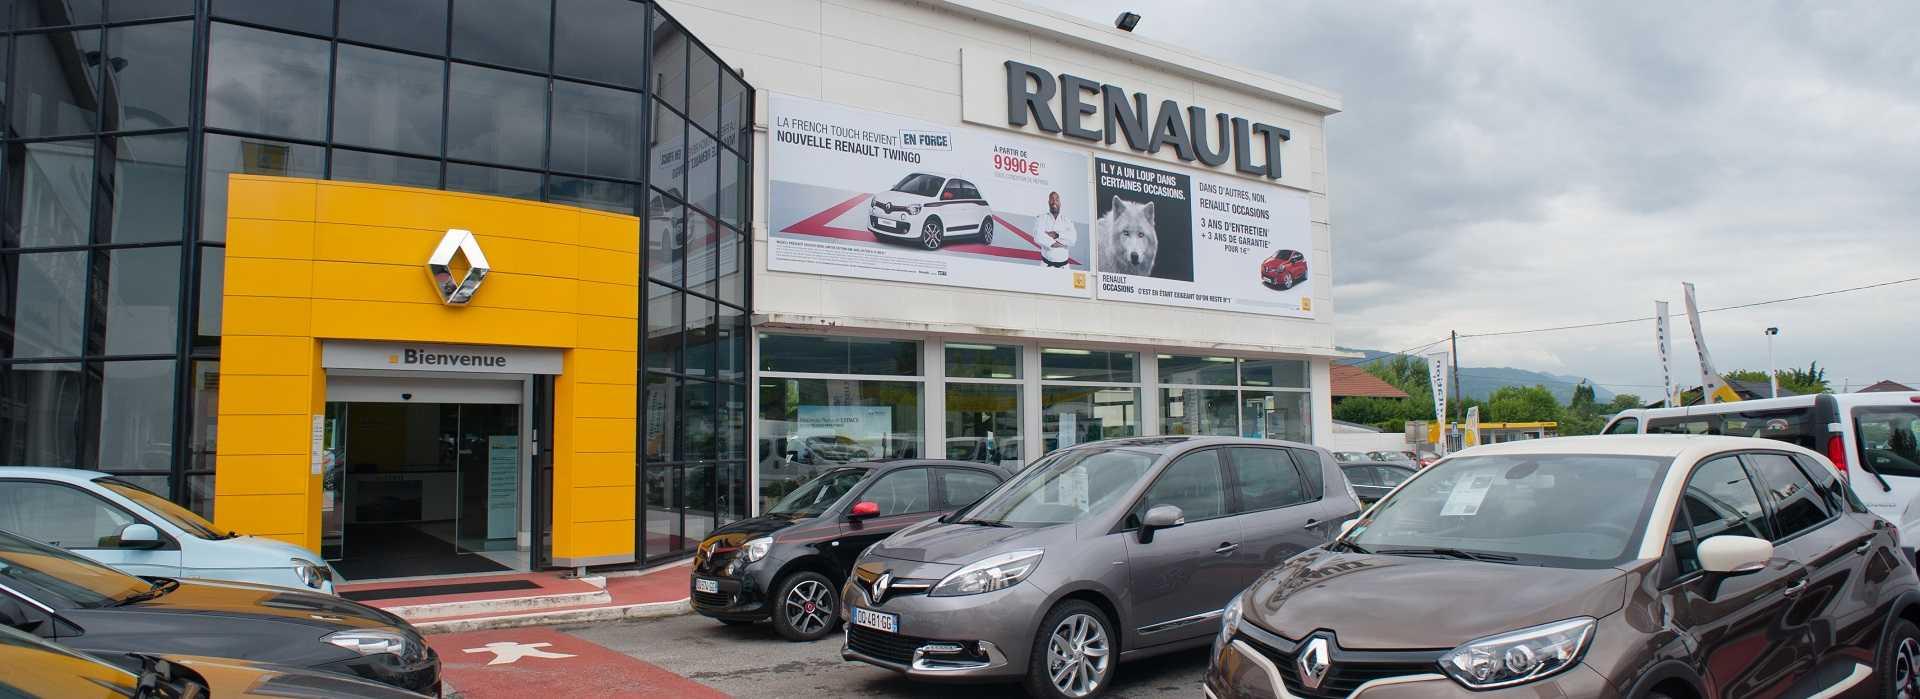 Renault Albertville